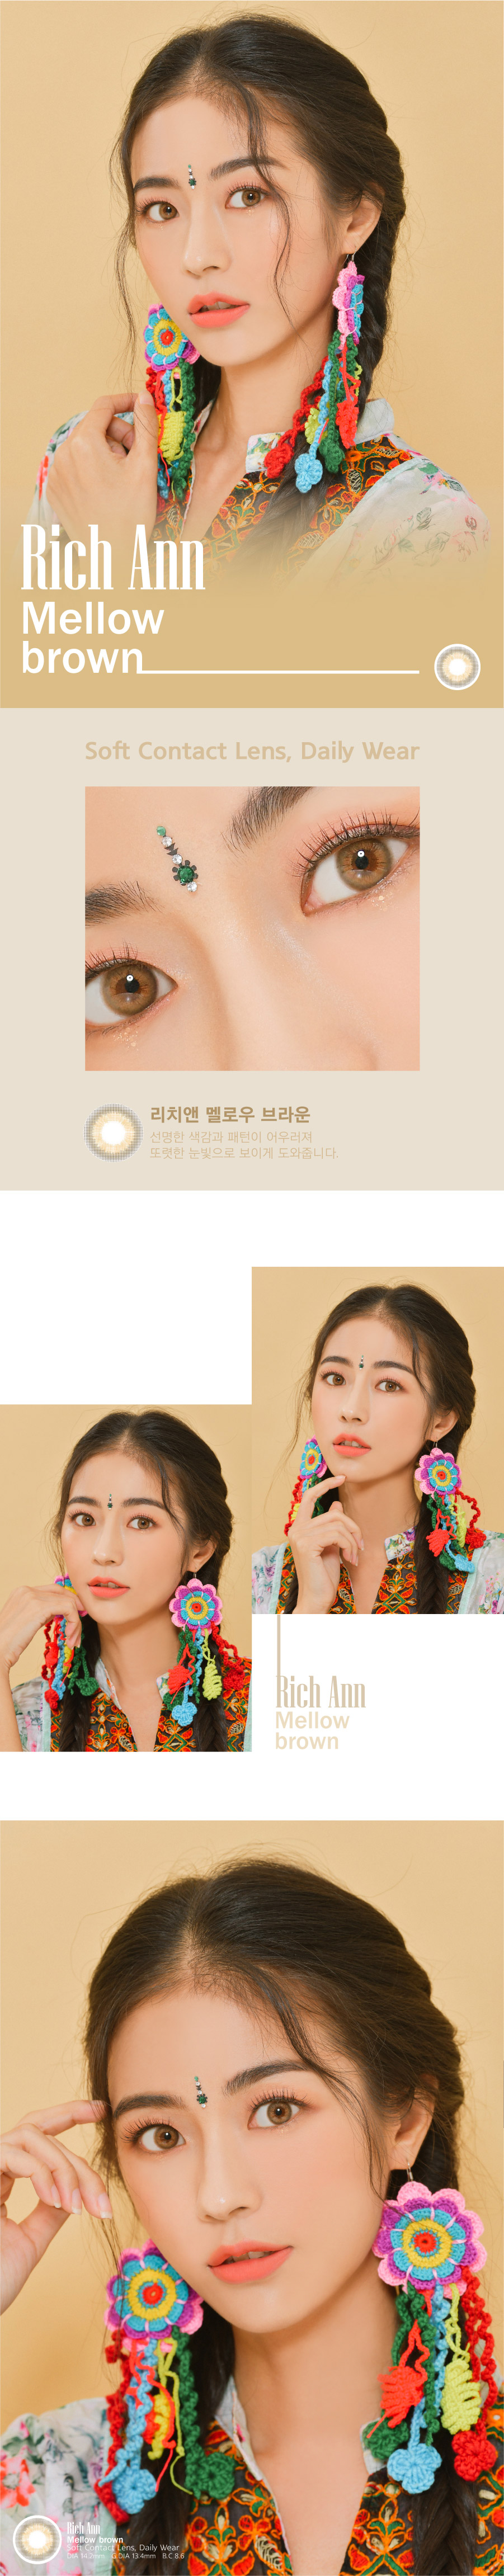 buy-ann365-mellow-brown-circle-lenses-klenspop-6.jpg